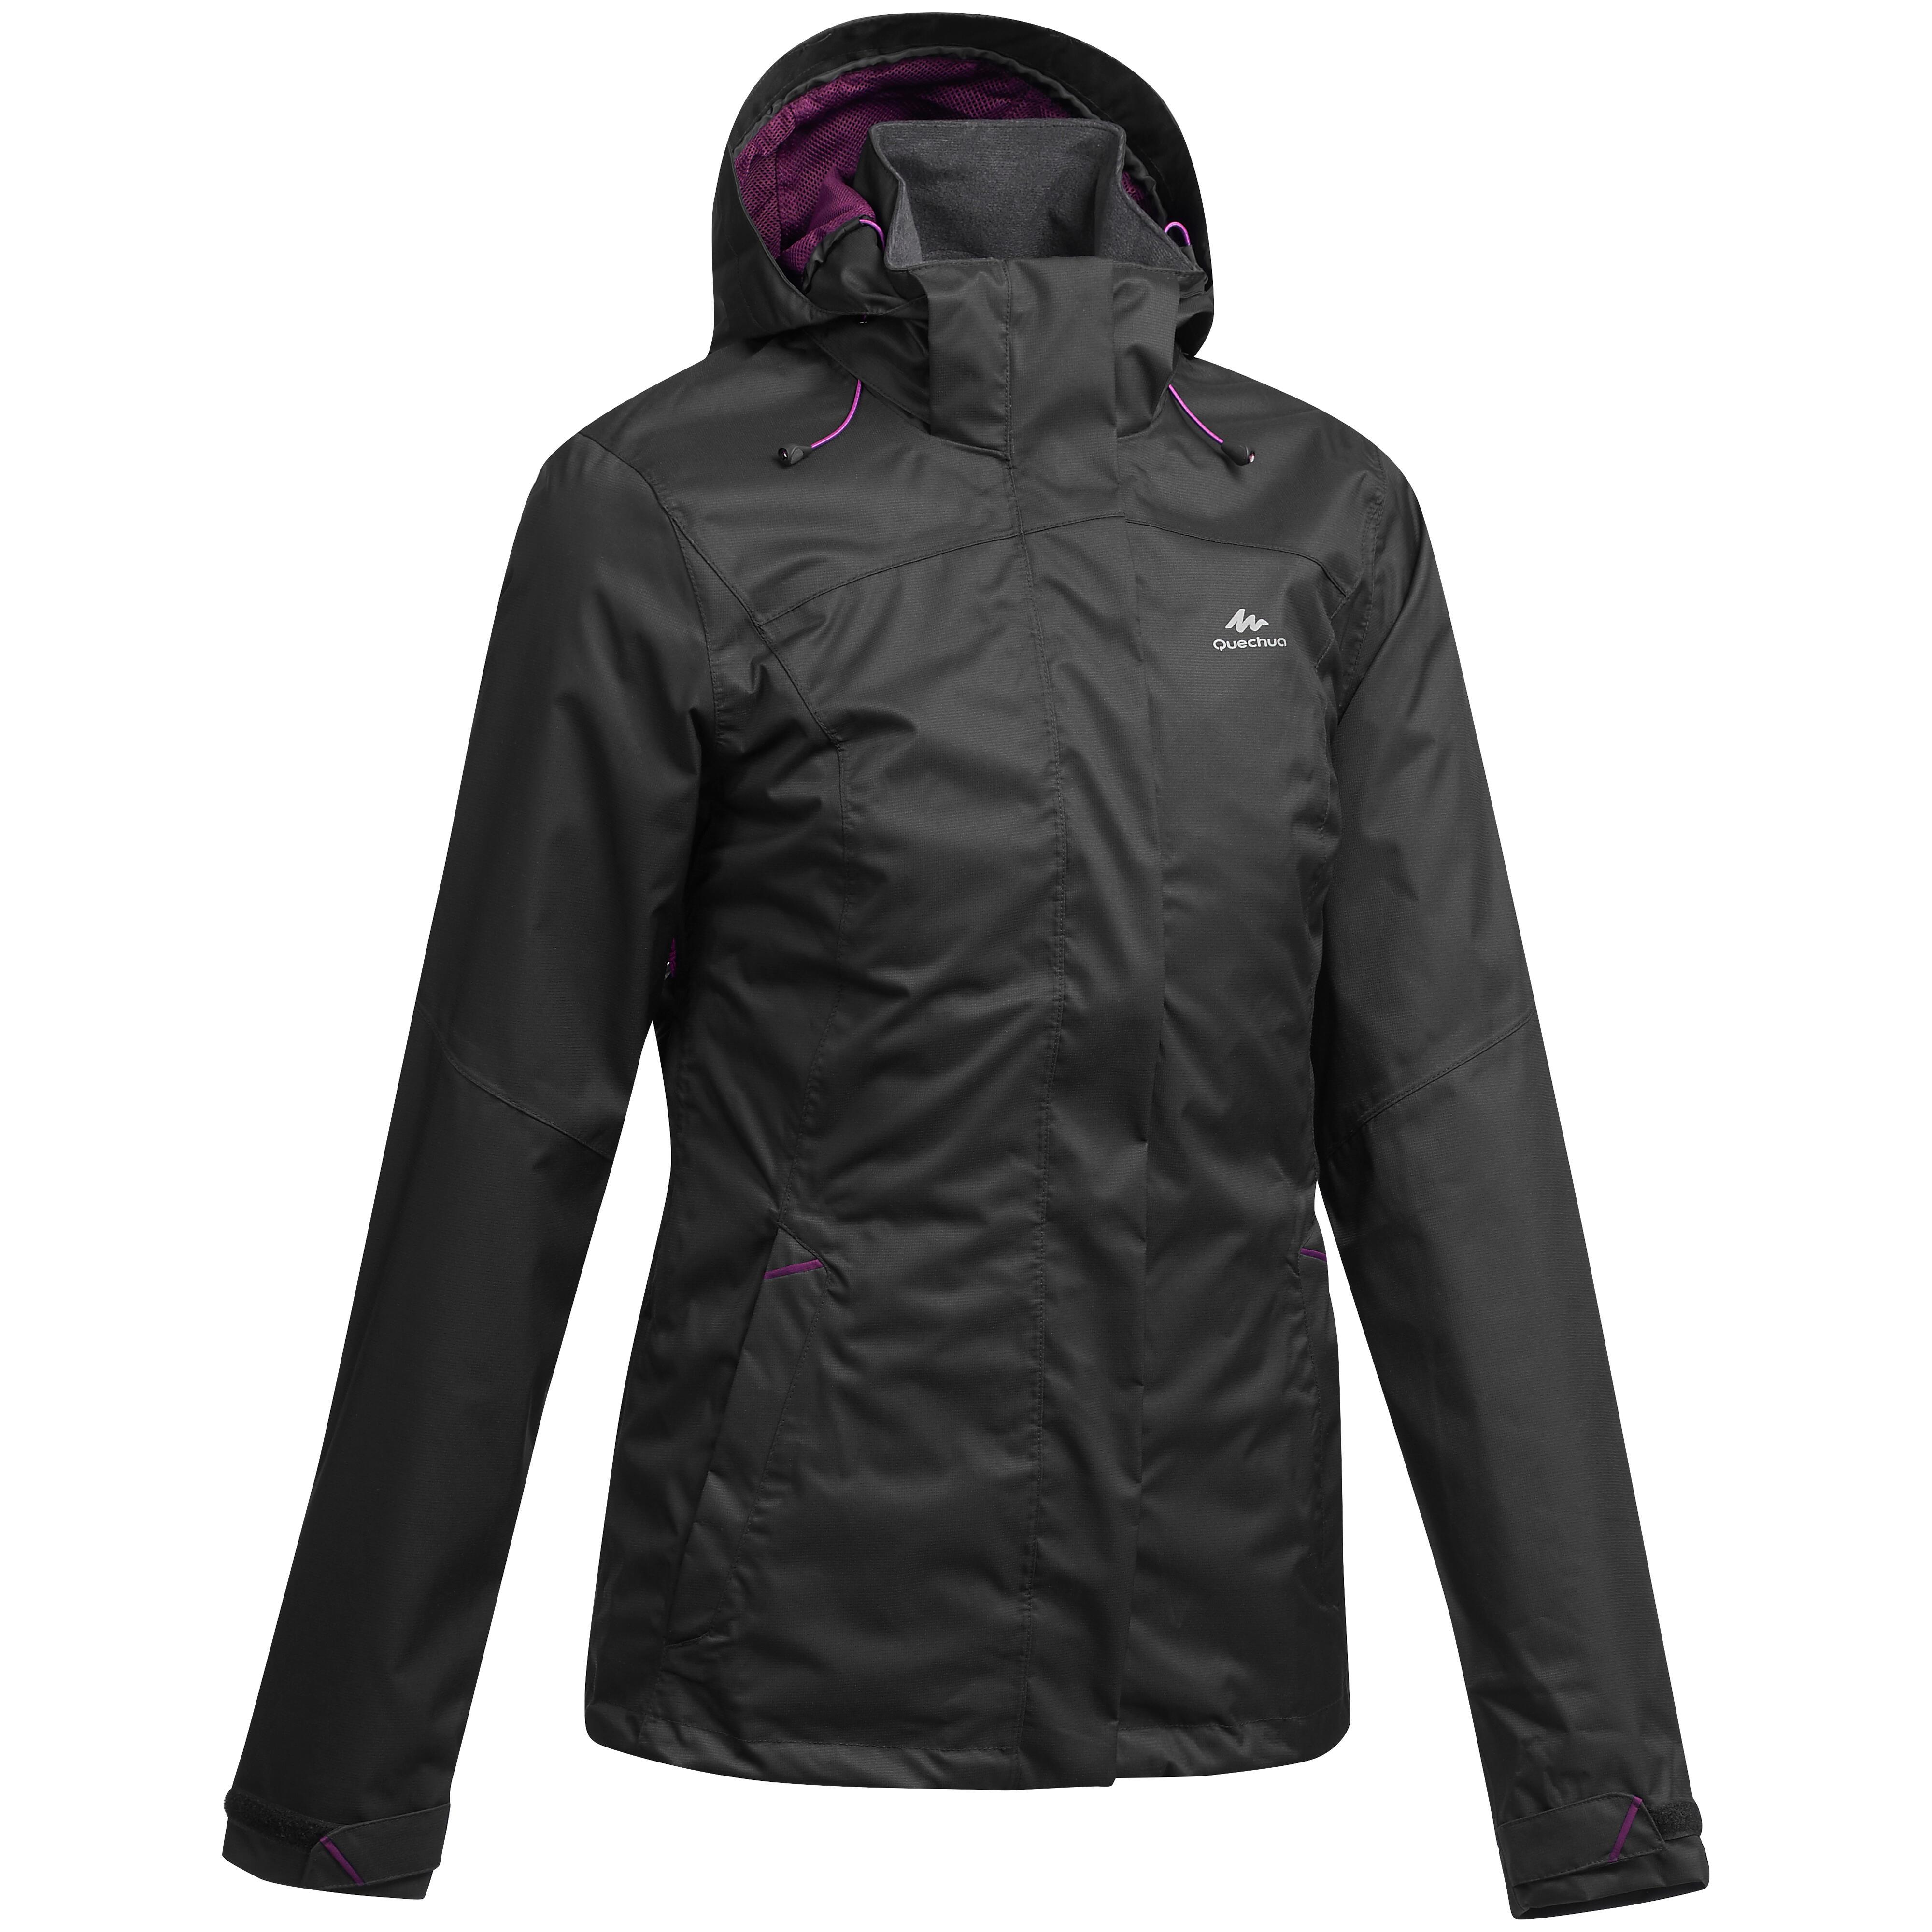 Wanderjacke Bergwandern MH100 wasserdicht Damen schwarz   Sportbekleidung > Sportjacken > Outdoorjacken   Schwarz - Violett   Quechua